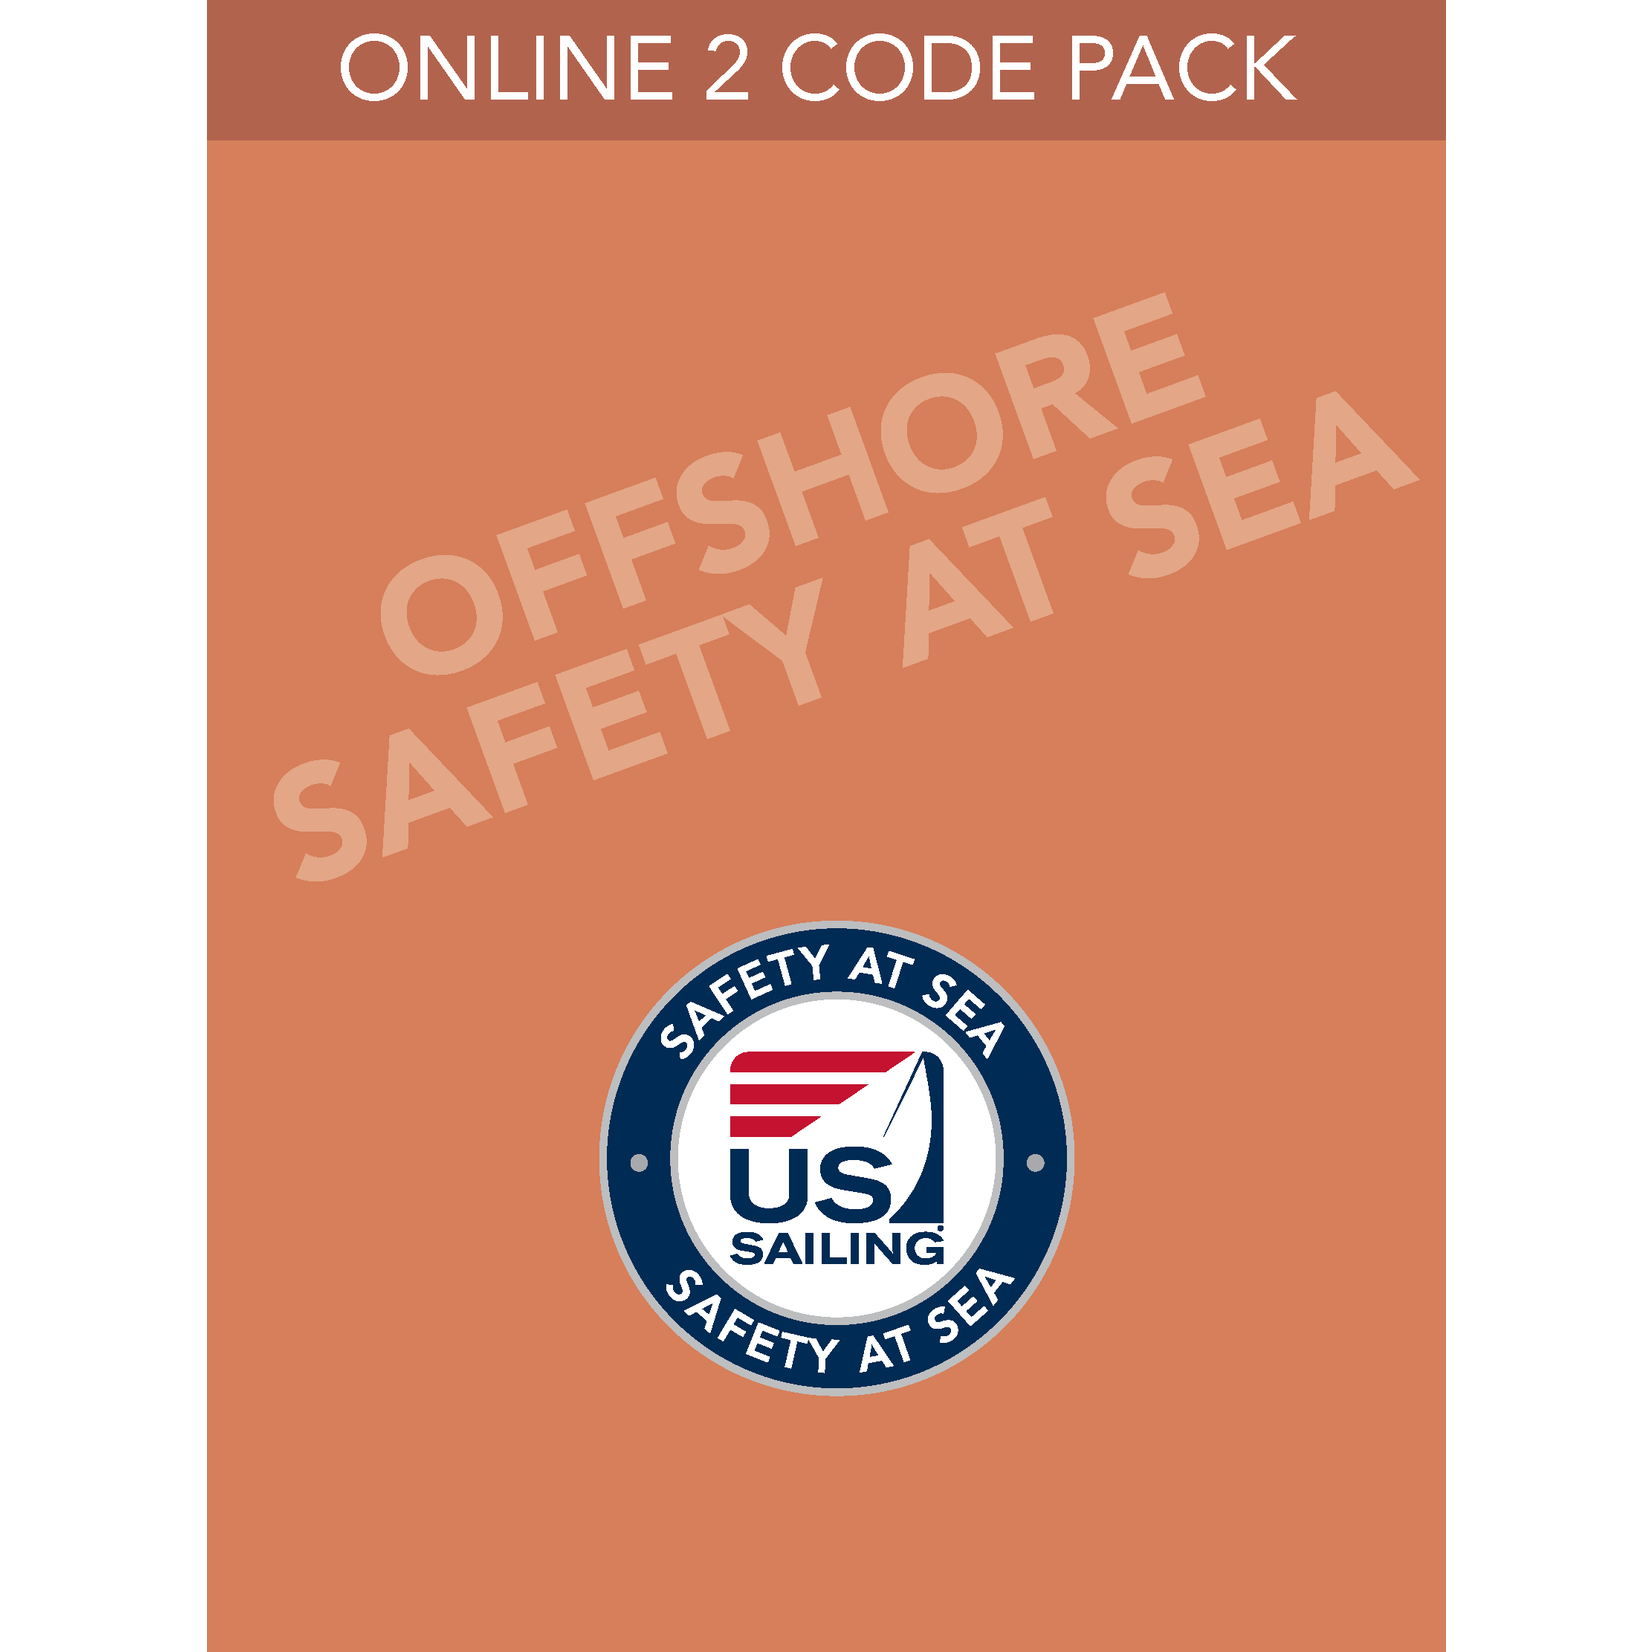 Offshore Online SAS: 2 Code Pack